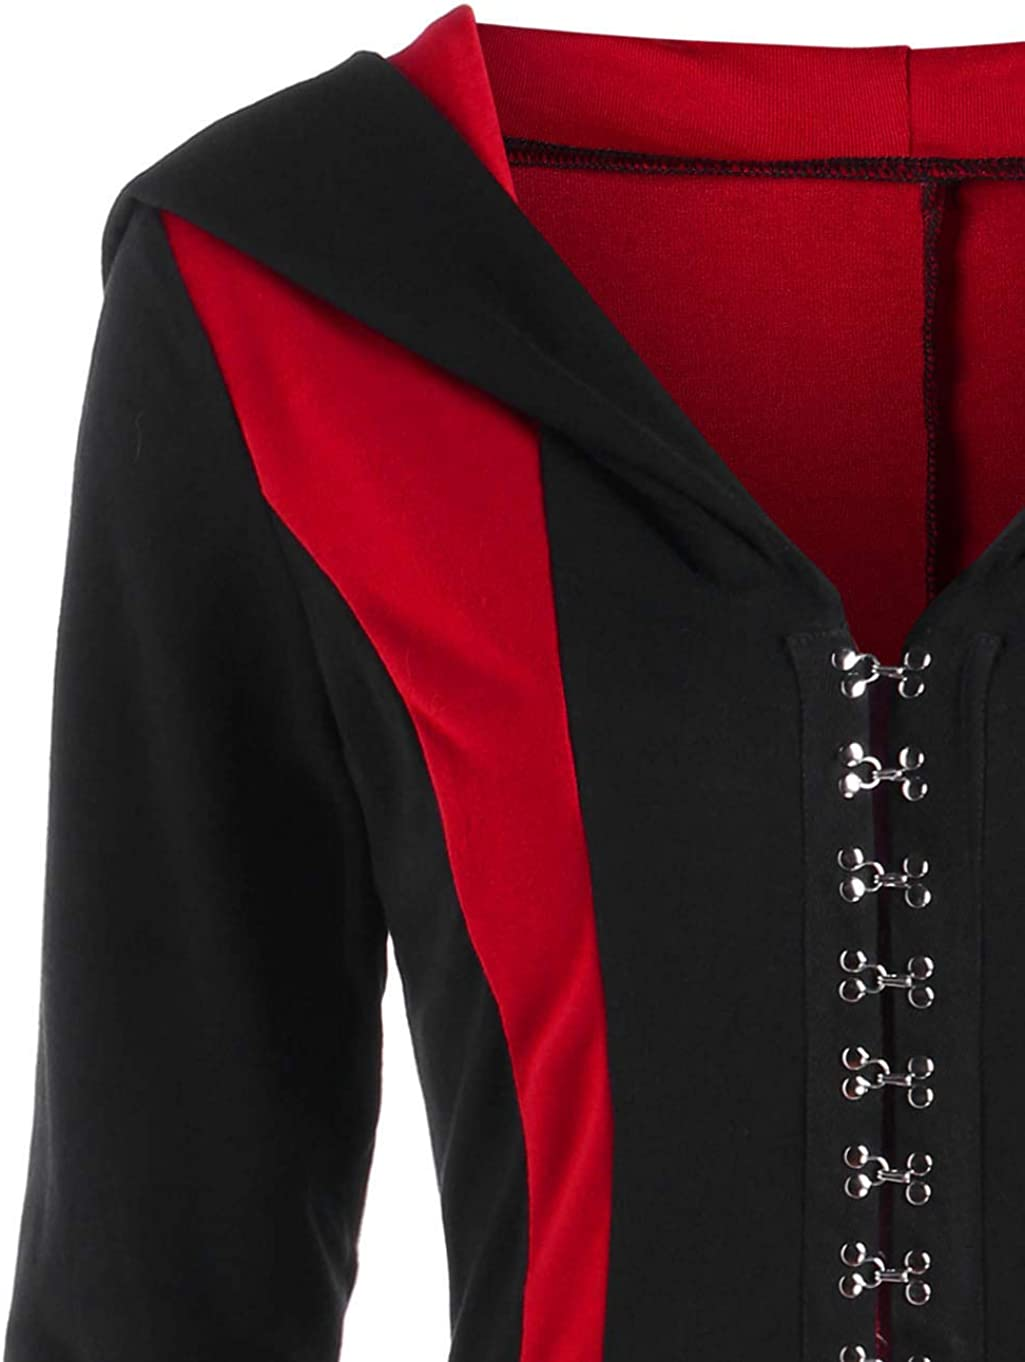 Alangbudu Women Halloween//Christmas Punk Hoodie Irregular Layered Tuxedo Jacket Slim Fit Tops Long Sleeve Outwear Coat